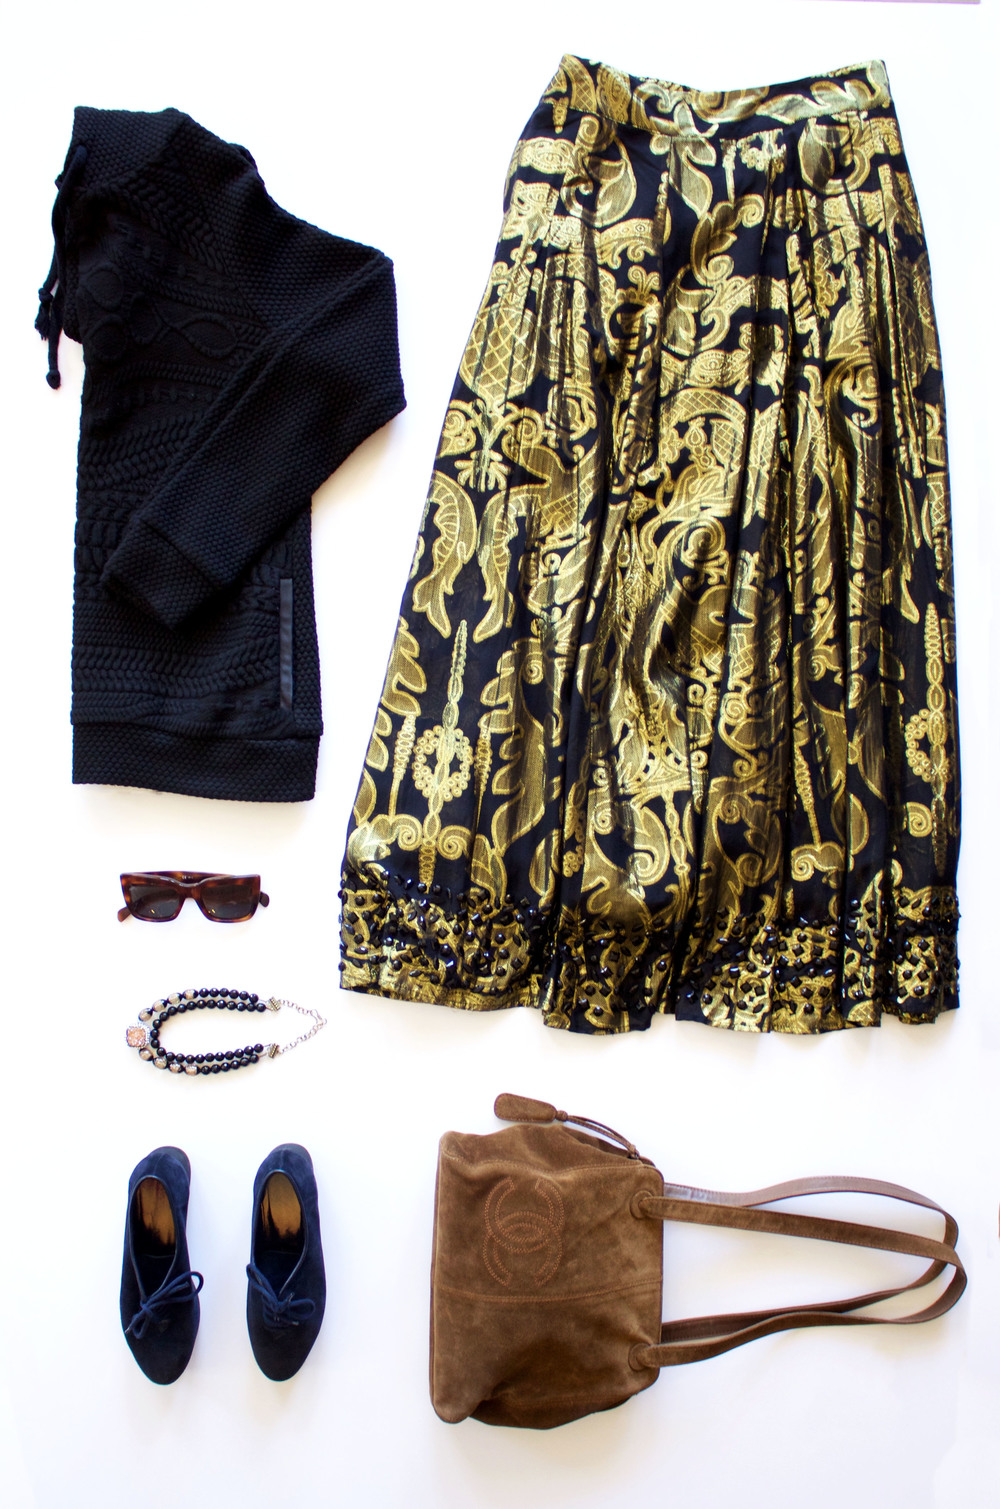 Celine Sunglasses, Yves Saint Laurent Shoes, Chanel Handbag